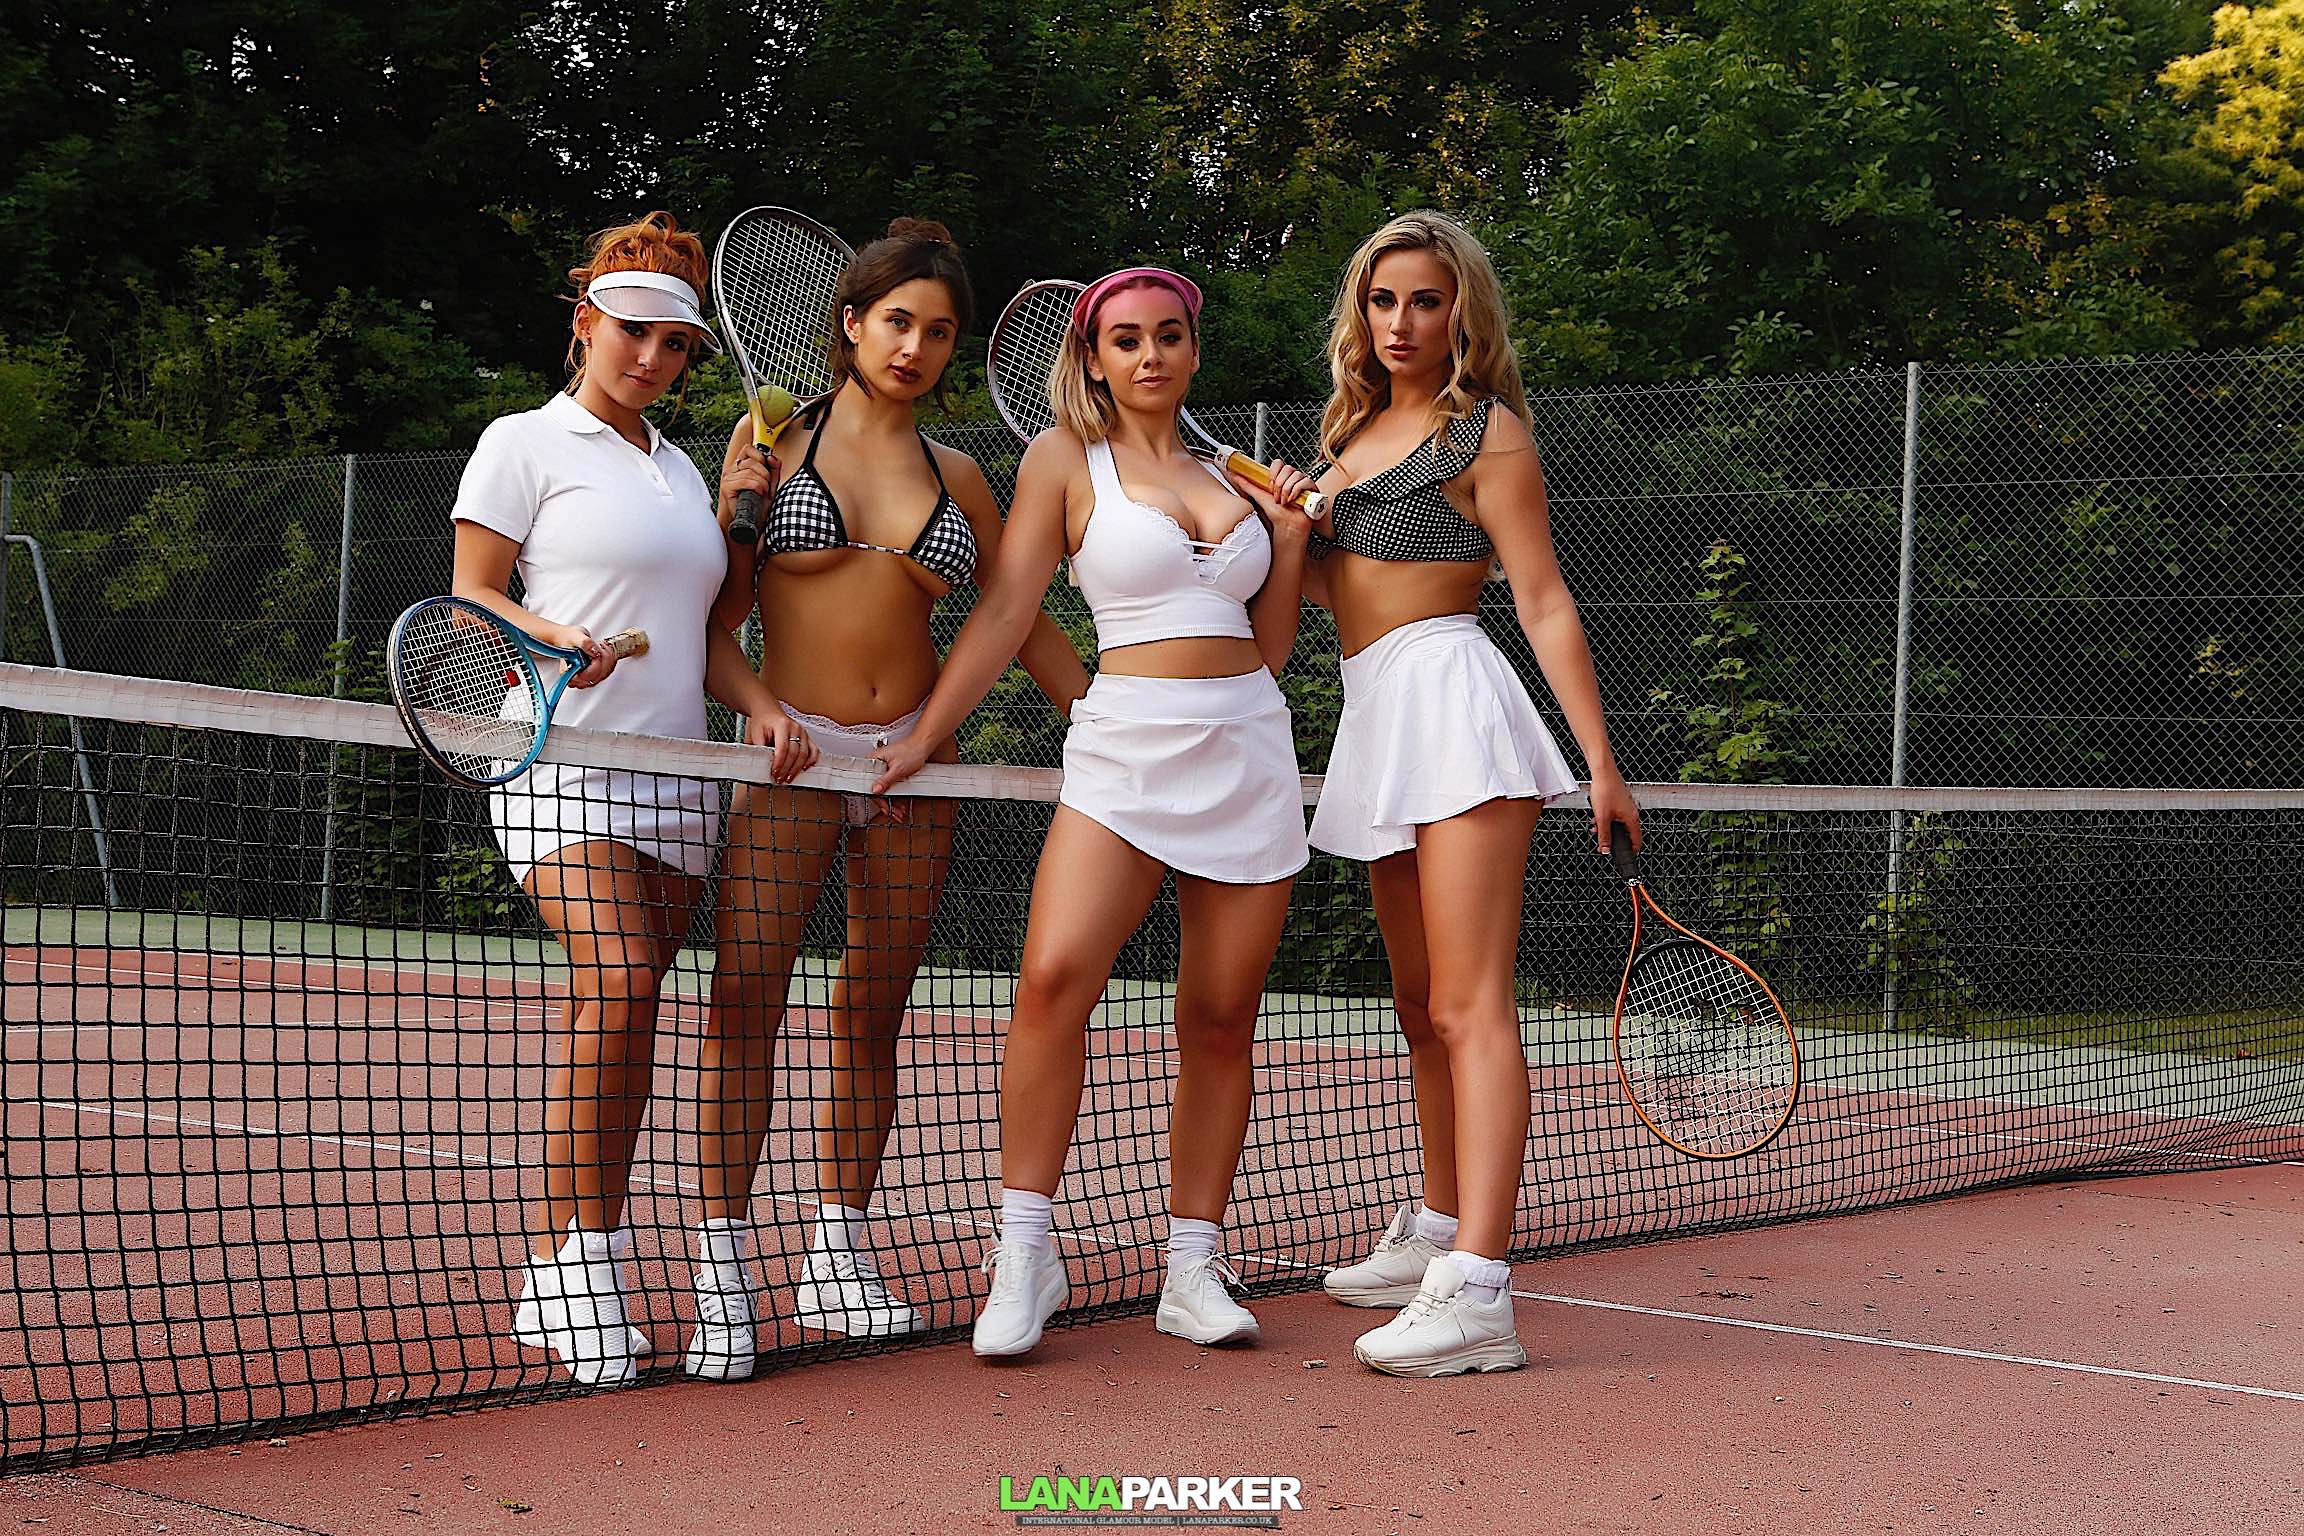 Topless Tennis – FREE VIDEO